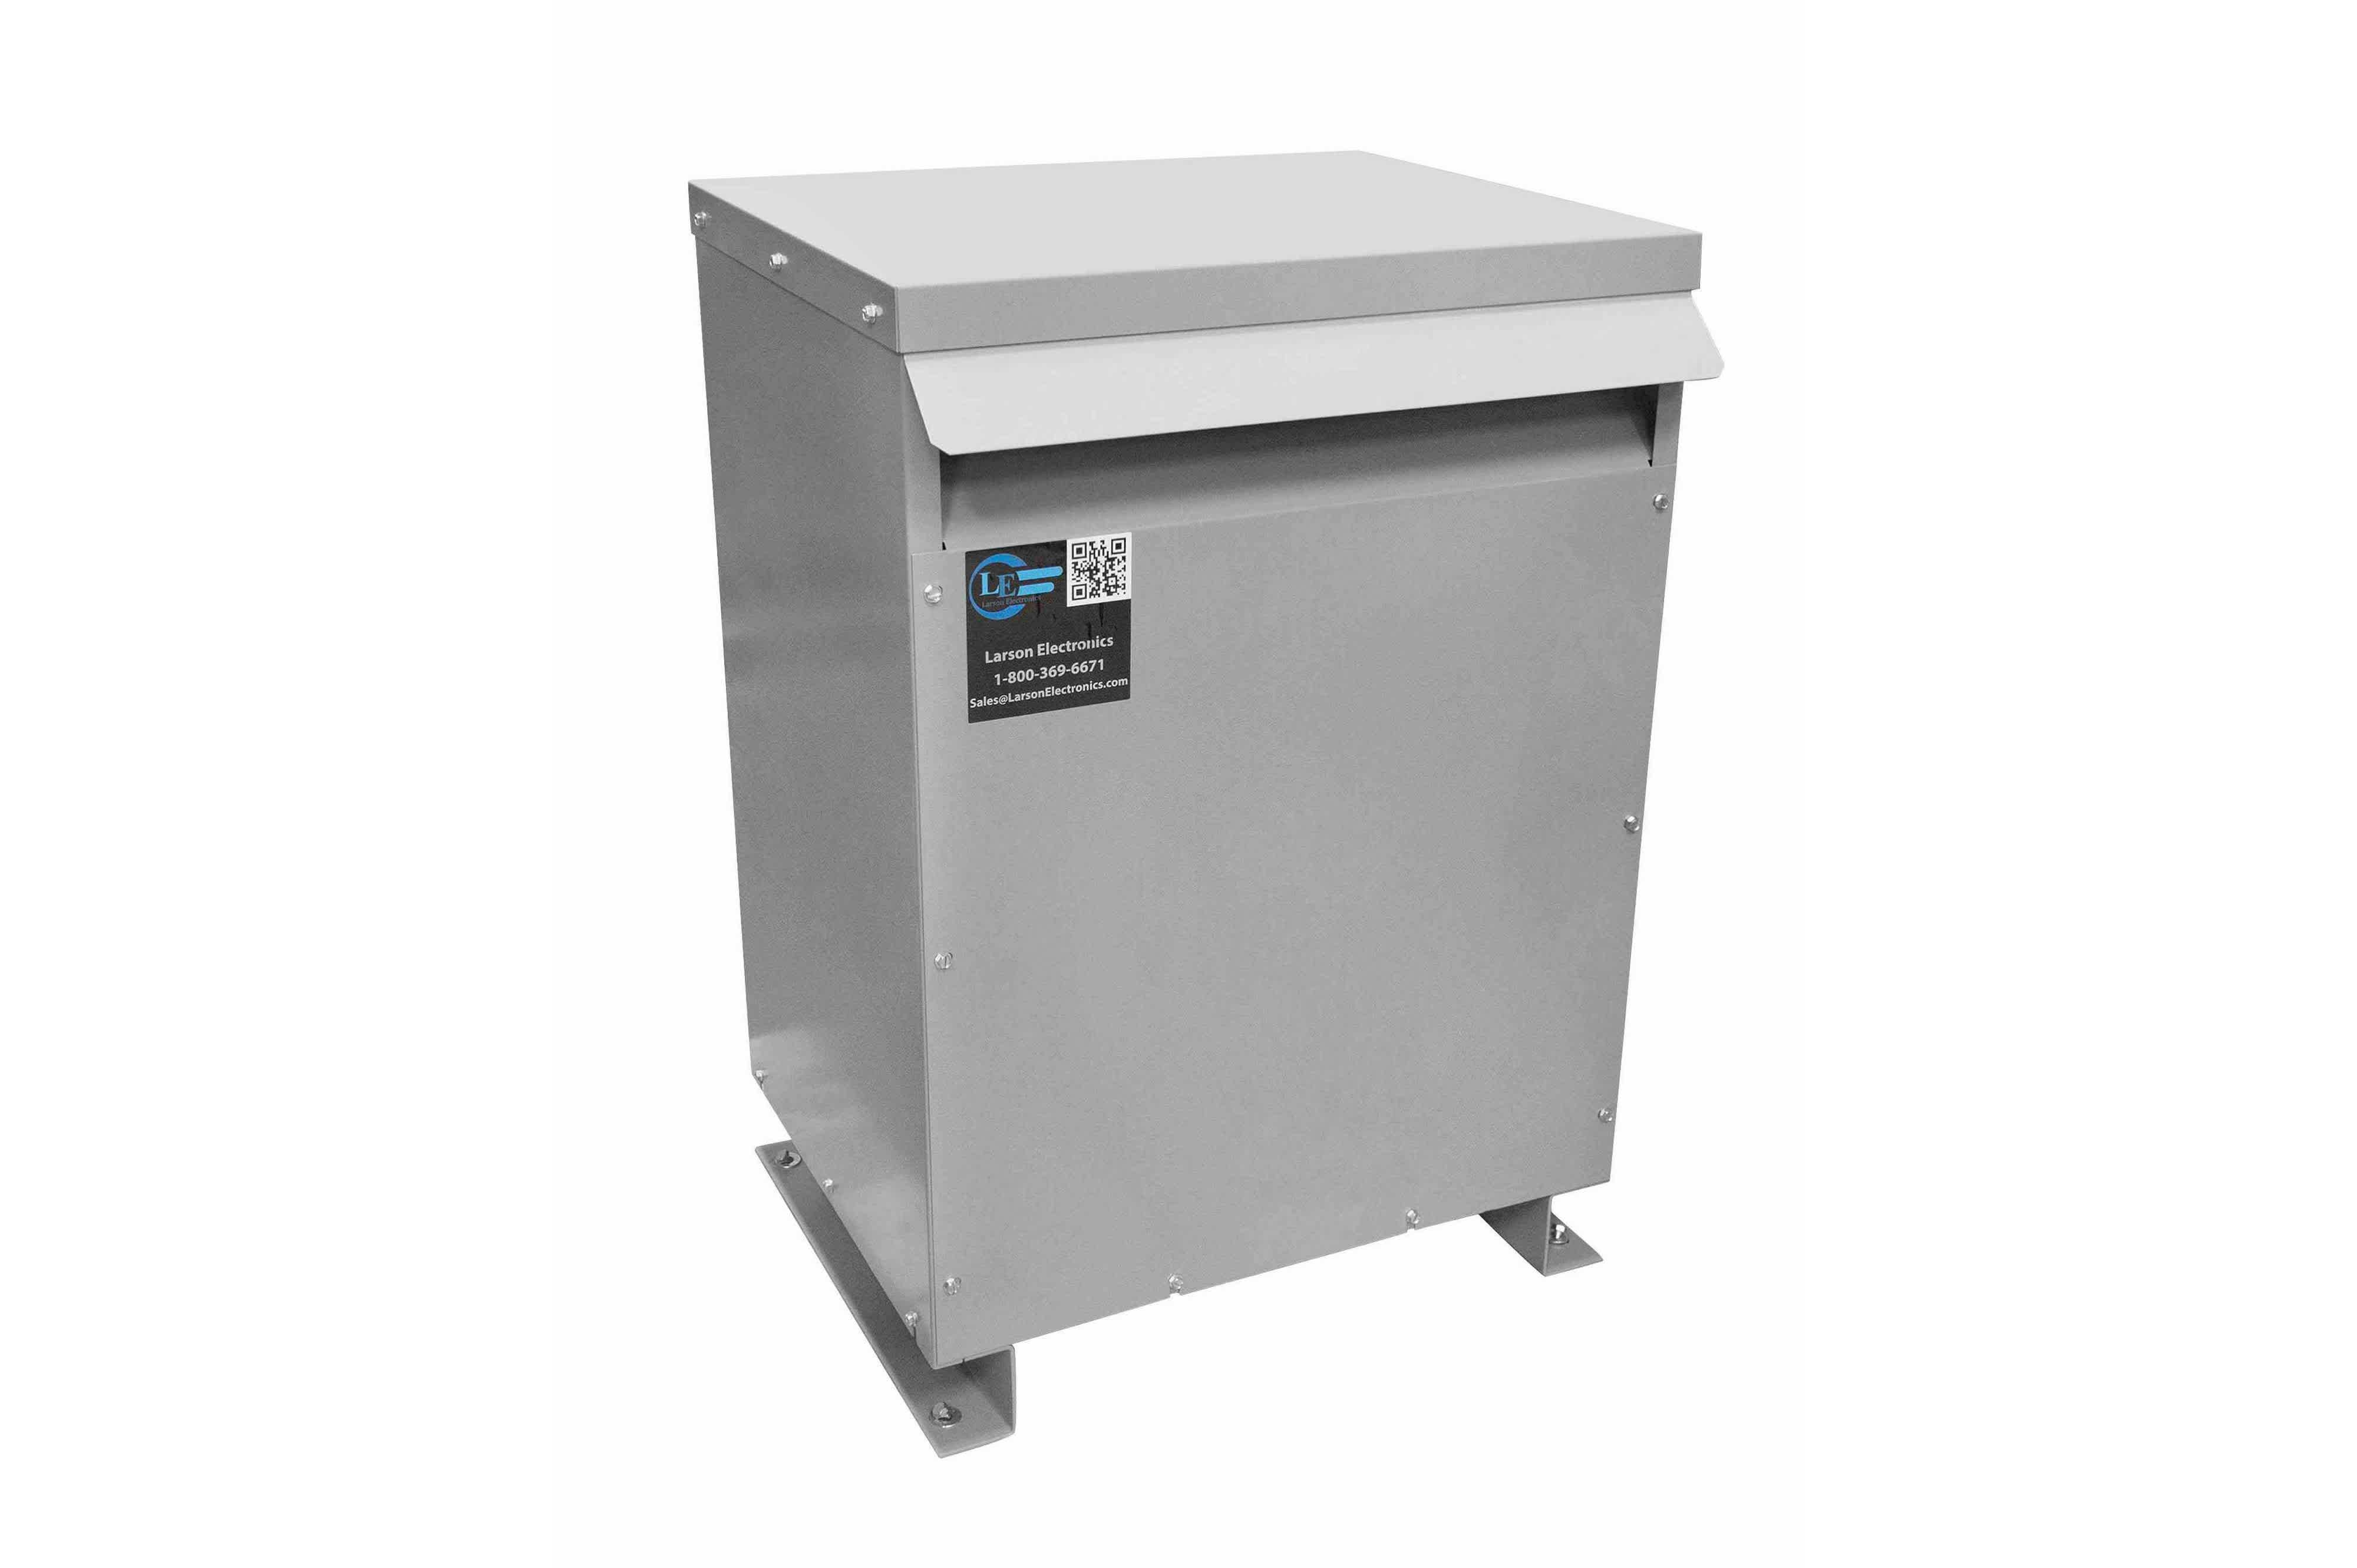 200 kVA 3PH DOE Transformer, 460V Delta Primary, 415Y/240 Wye-N Secondary, N3R, Ventilated, 60 Hz